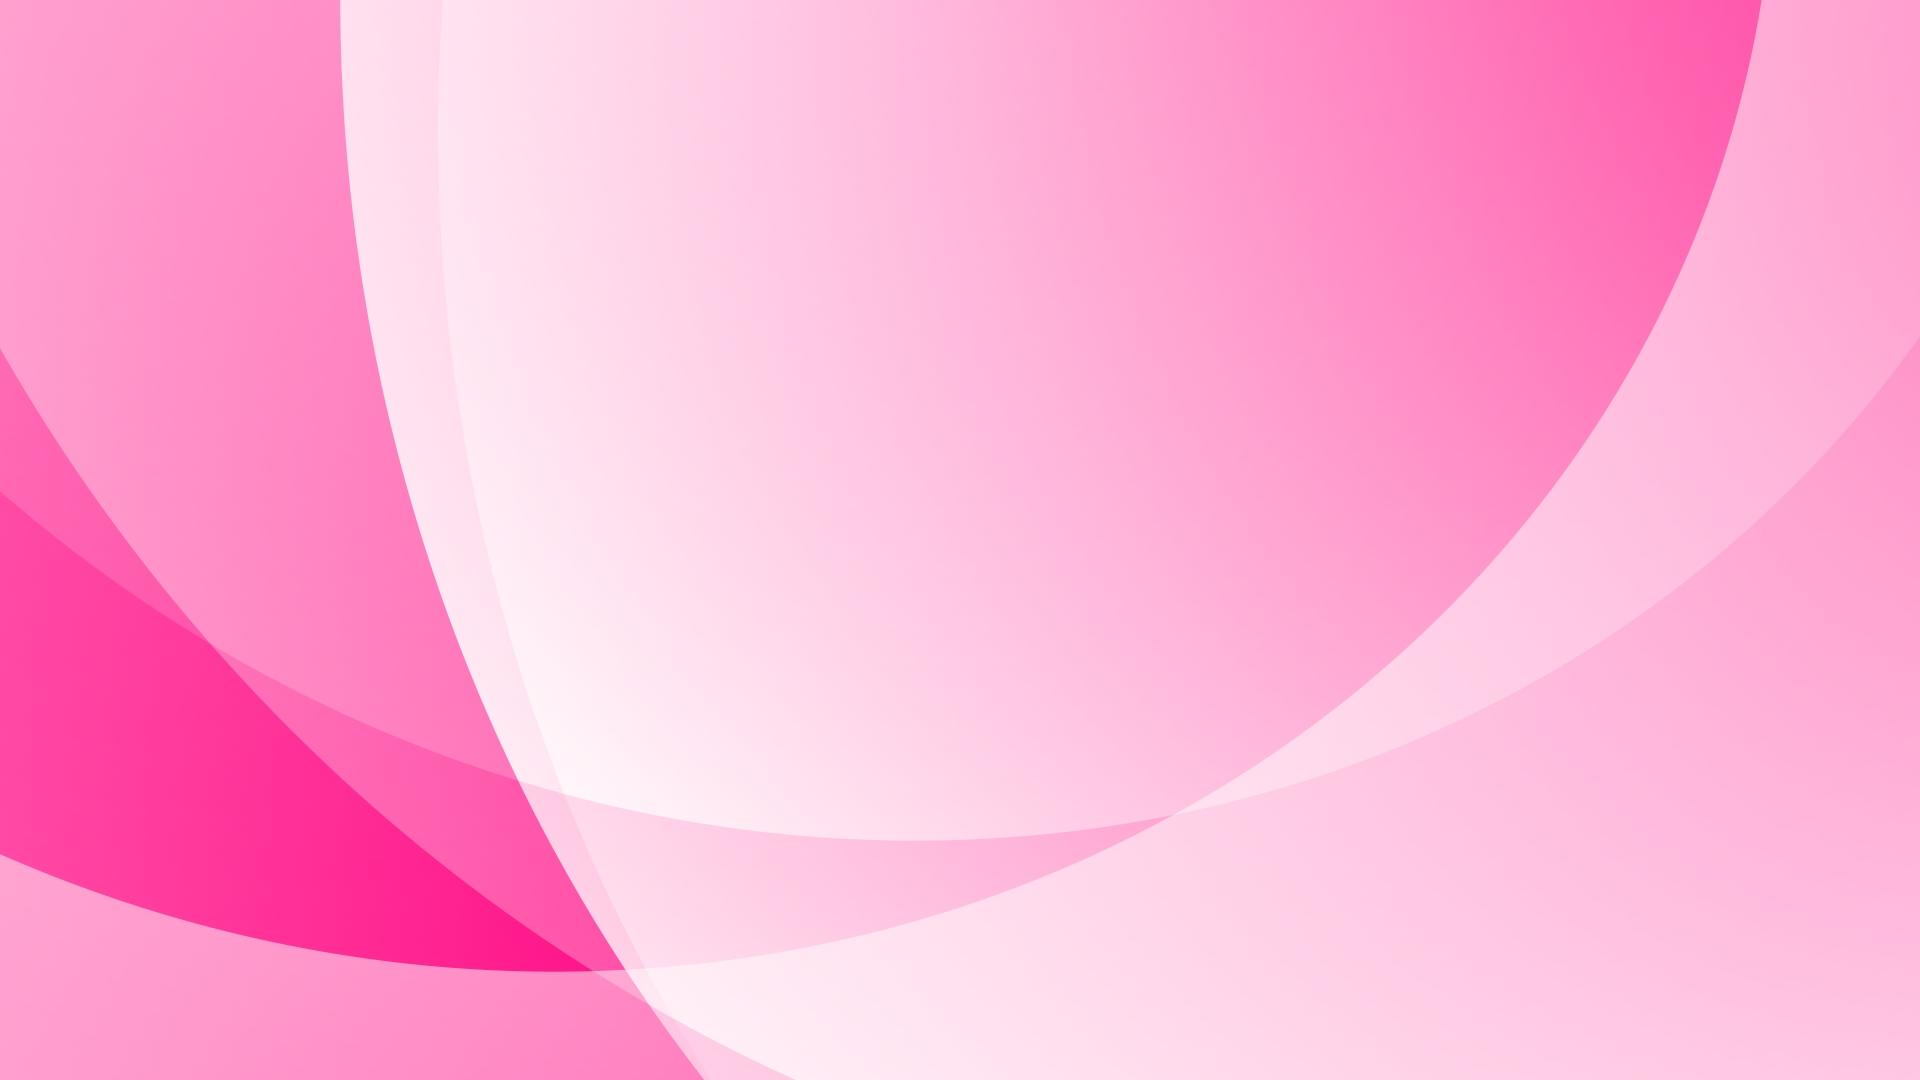 Light Pink Background Hd